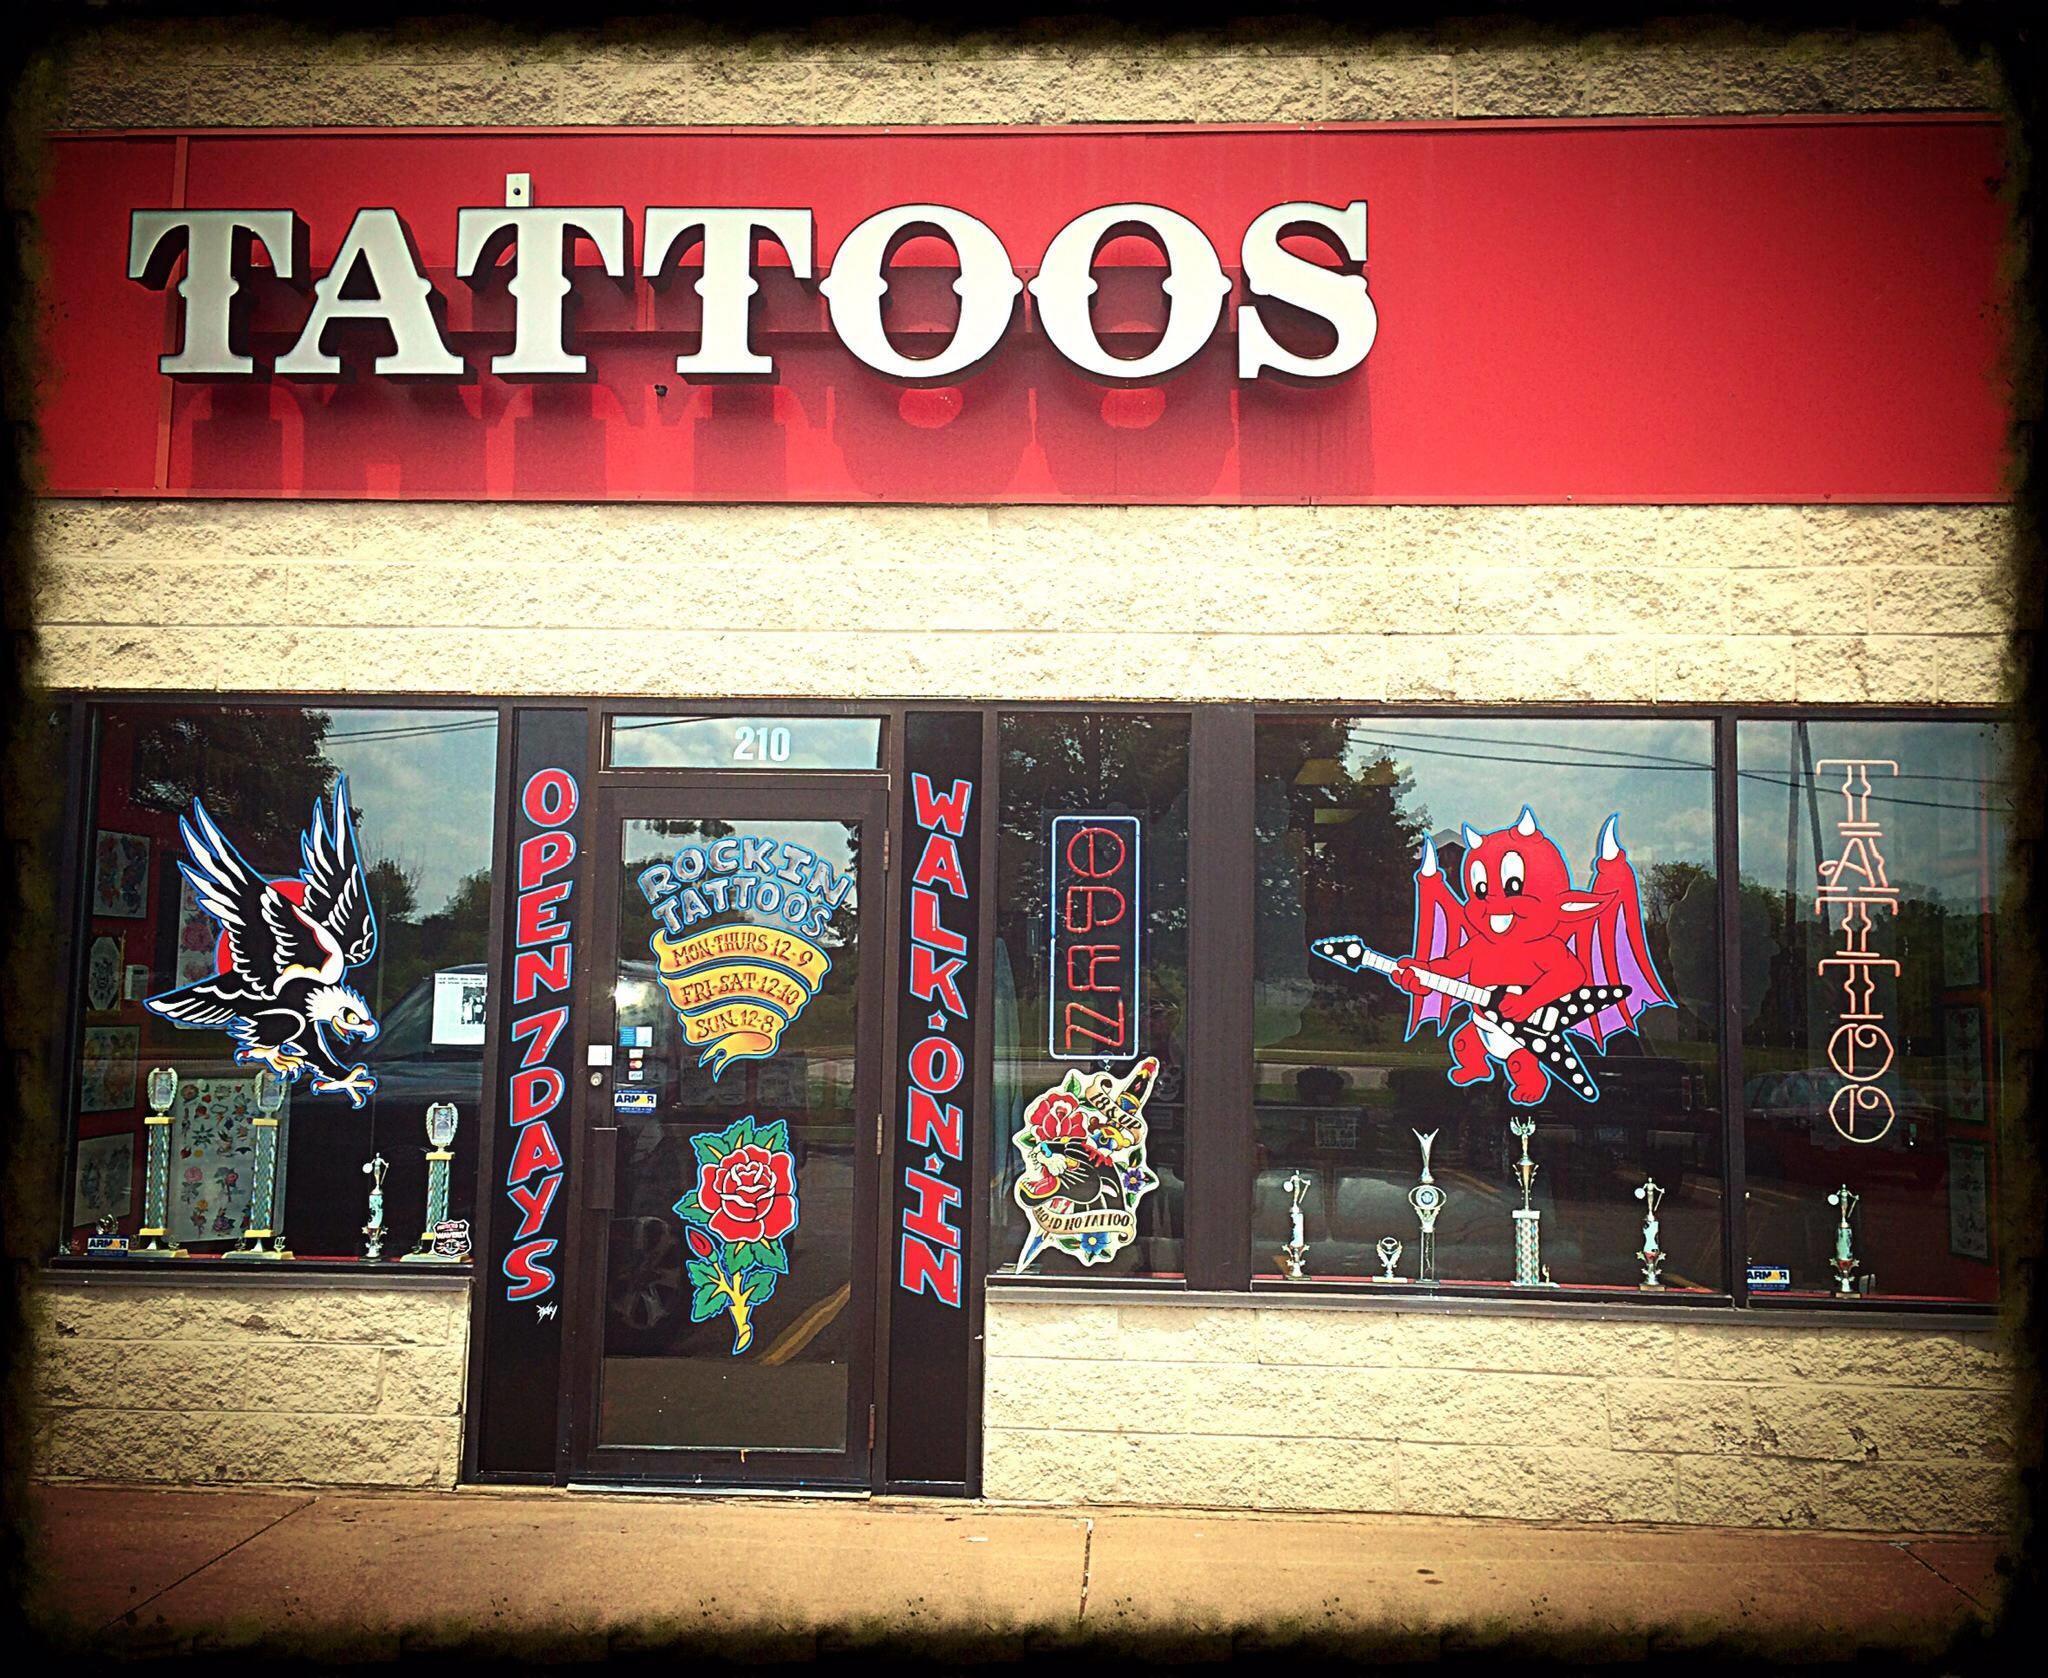 Rockin tattoos in eagan mn 55121 for Tattoo shops in mn